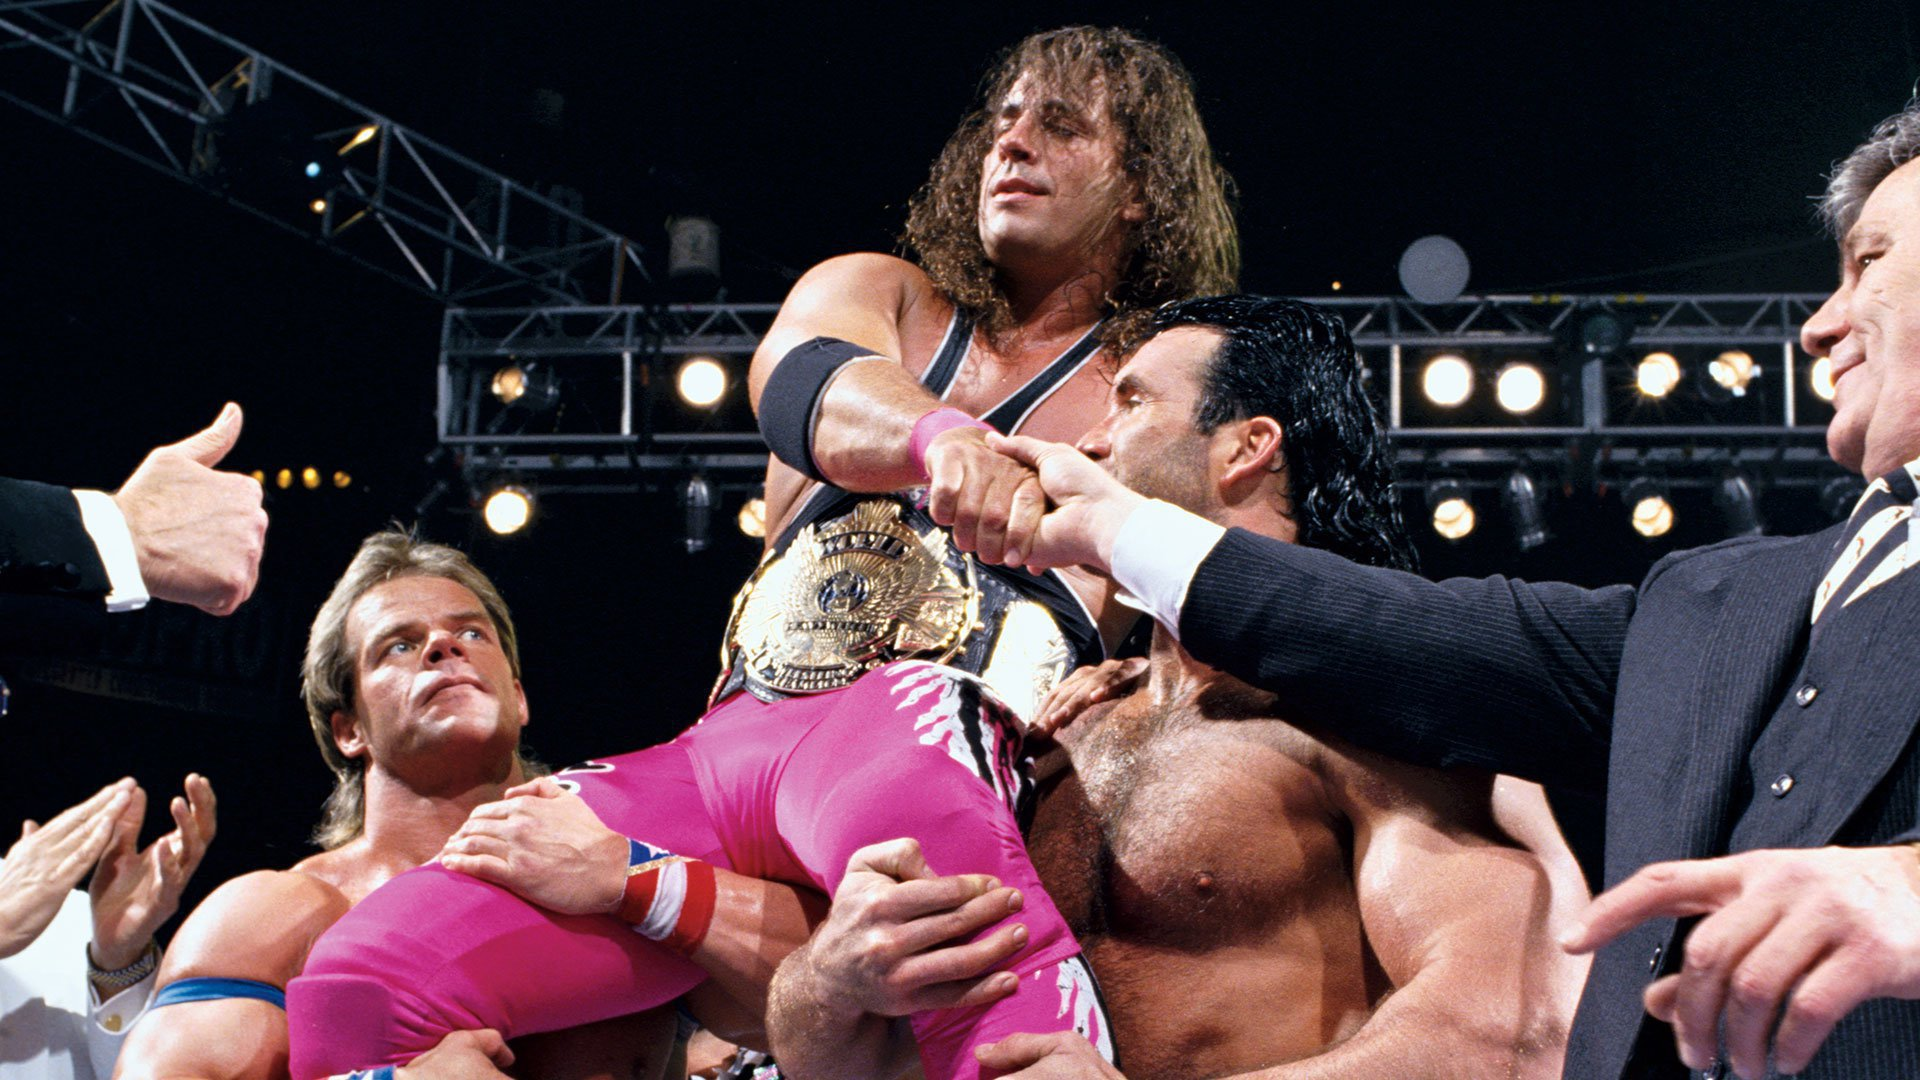 Семья борцов харт - hart wrestling family - qaz.wiki